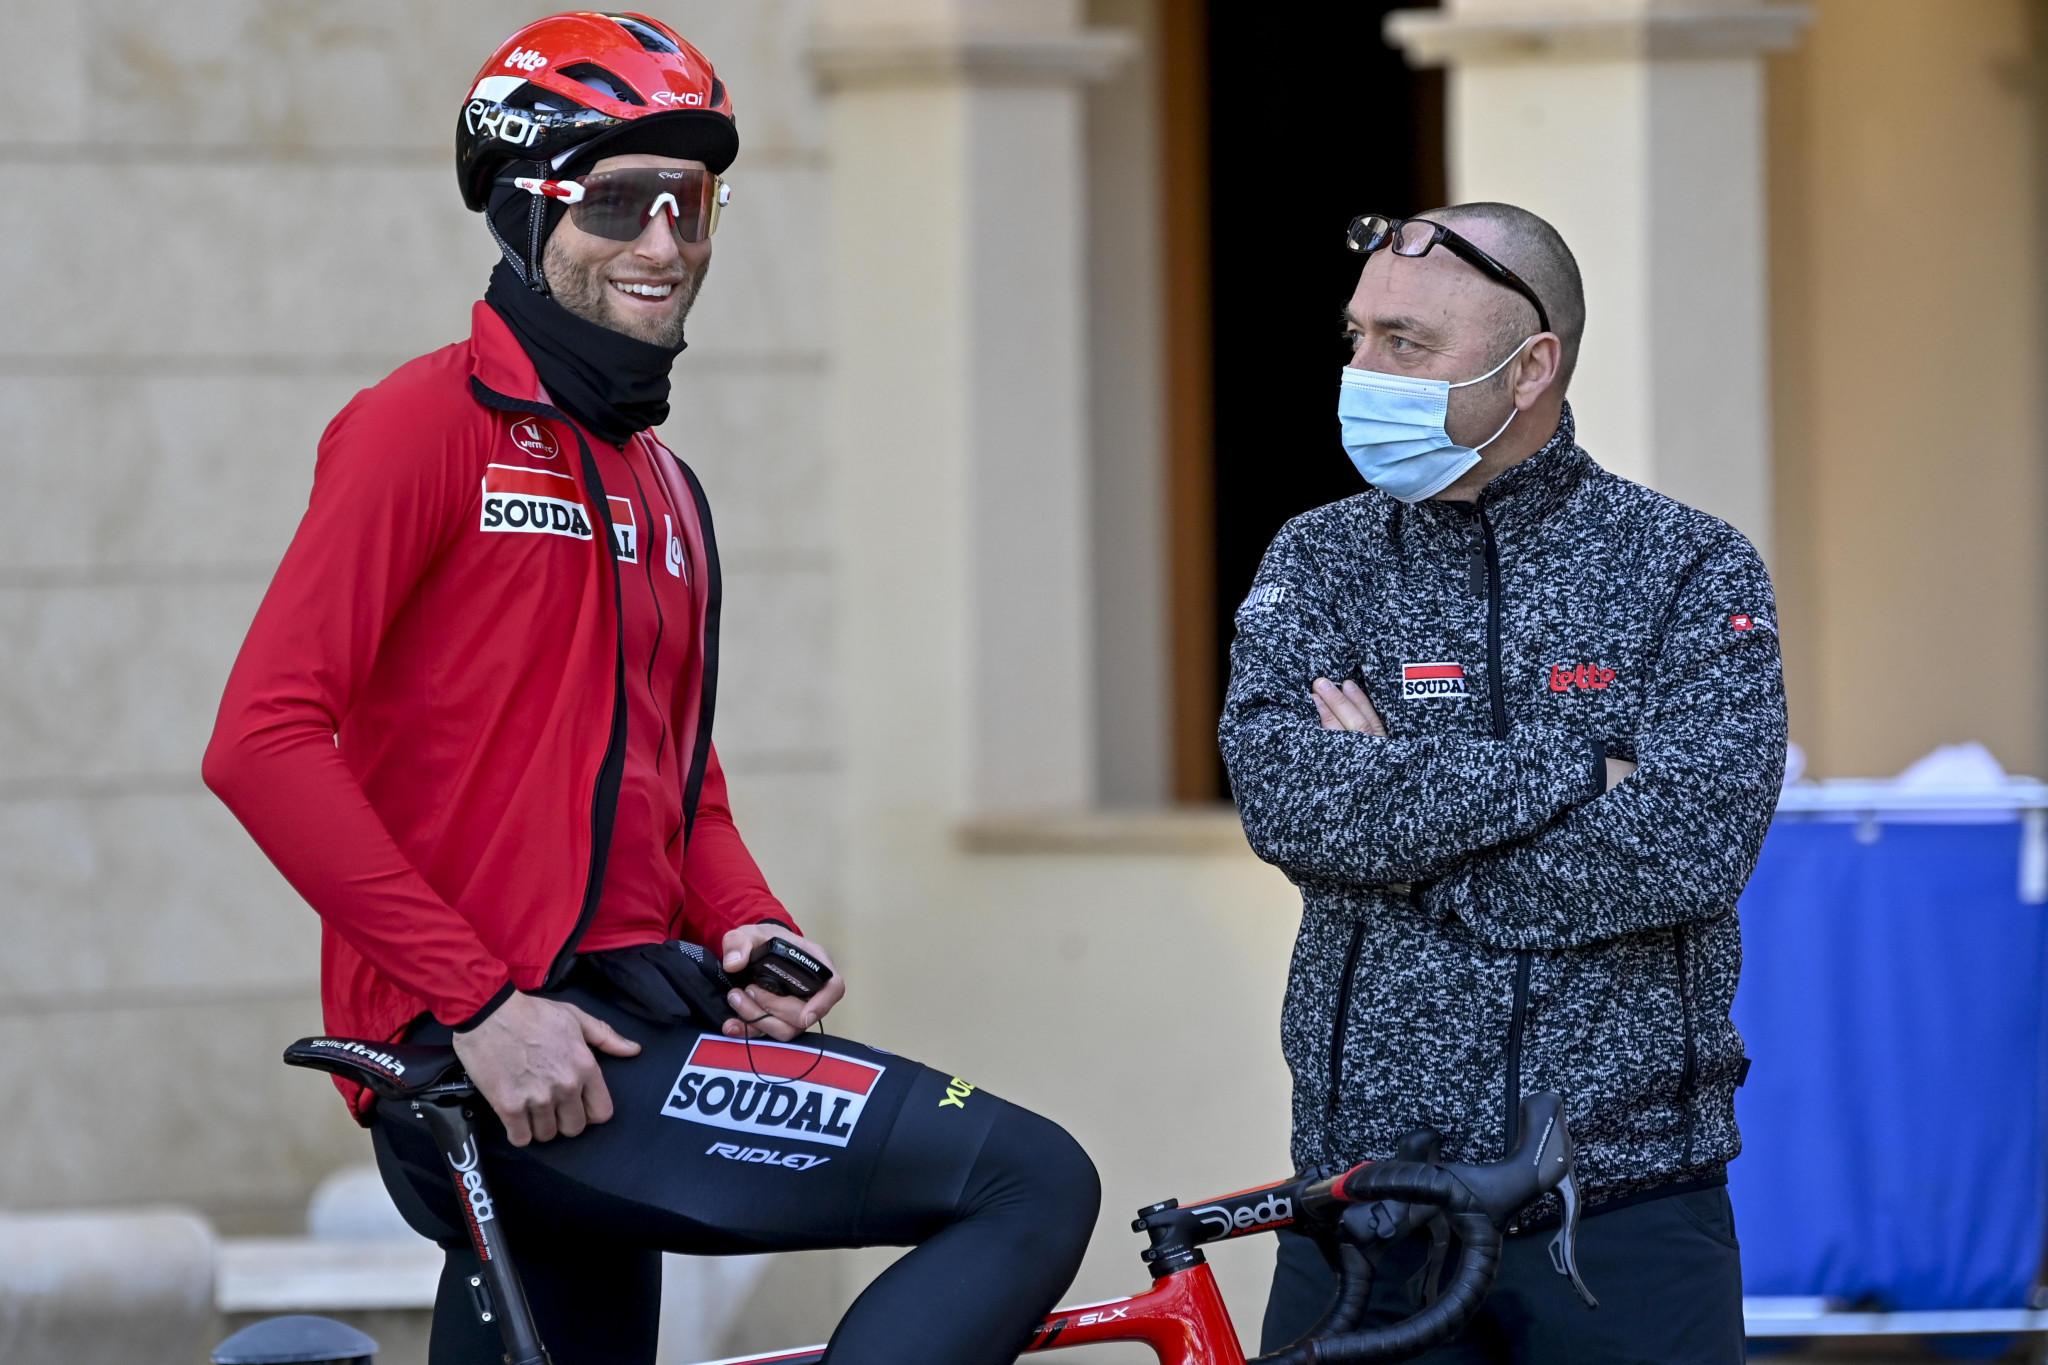 Marczyński withdrawn from Giro d'Italia after suffering long COVID symptoms